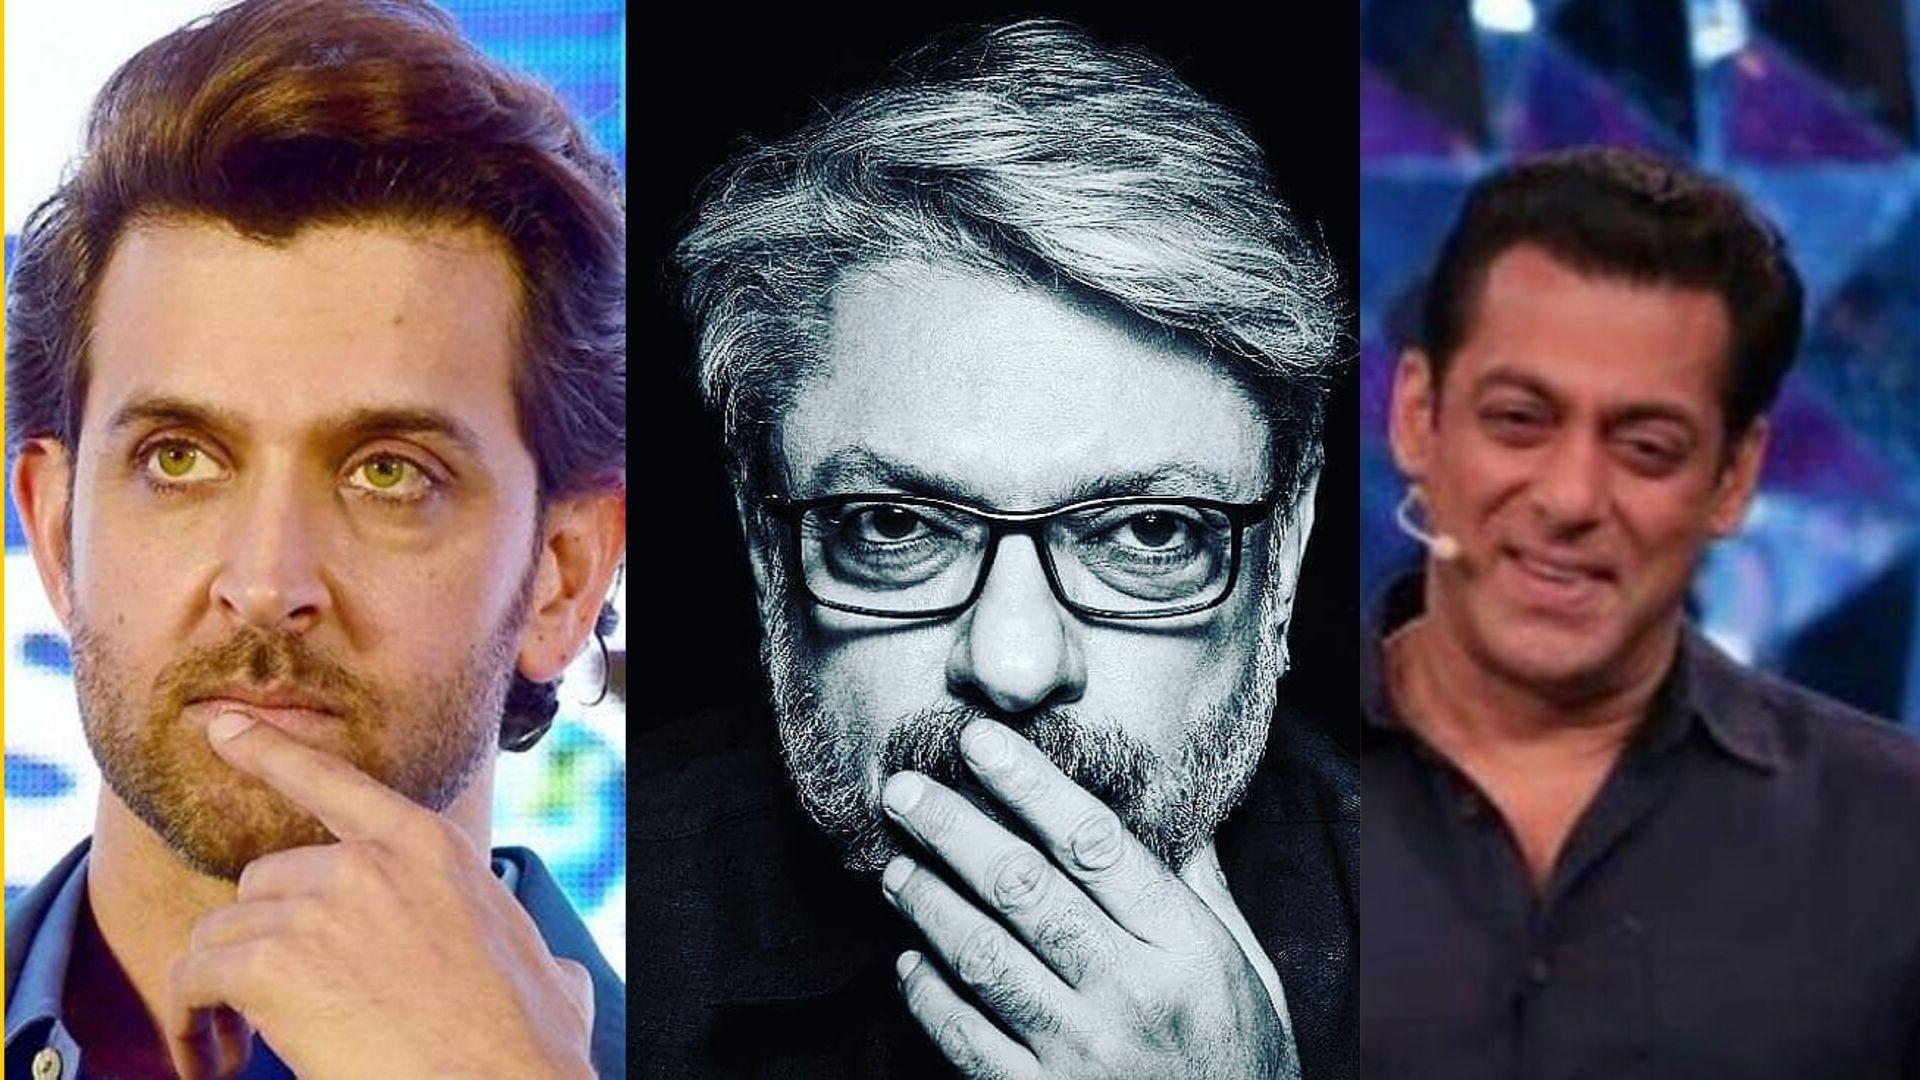 Hrithik to Replace Salman in Sanjay Leela Bhansali's 'Inshallah'?